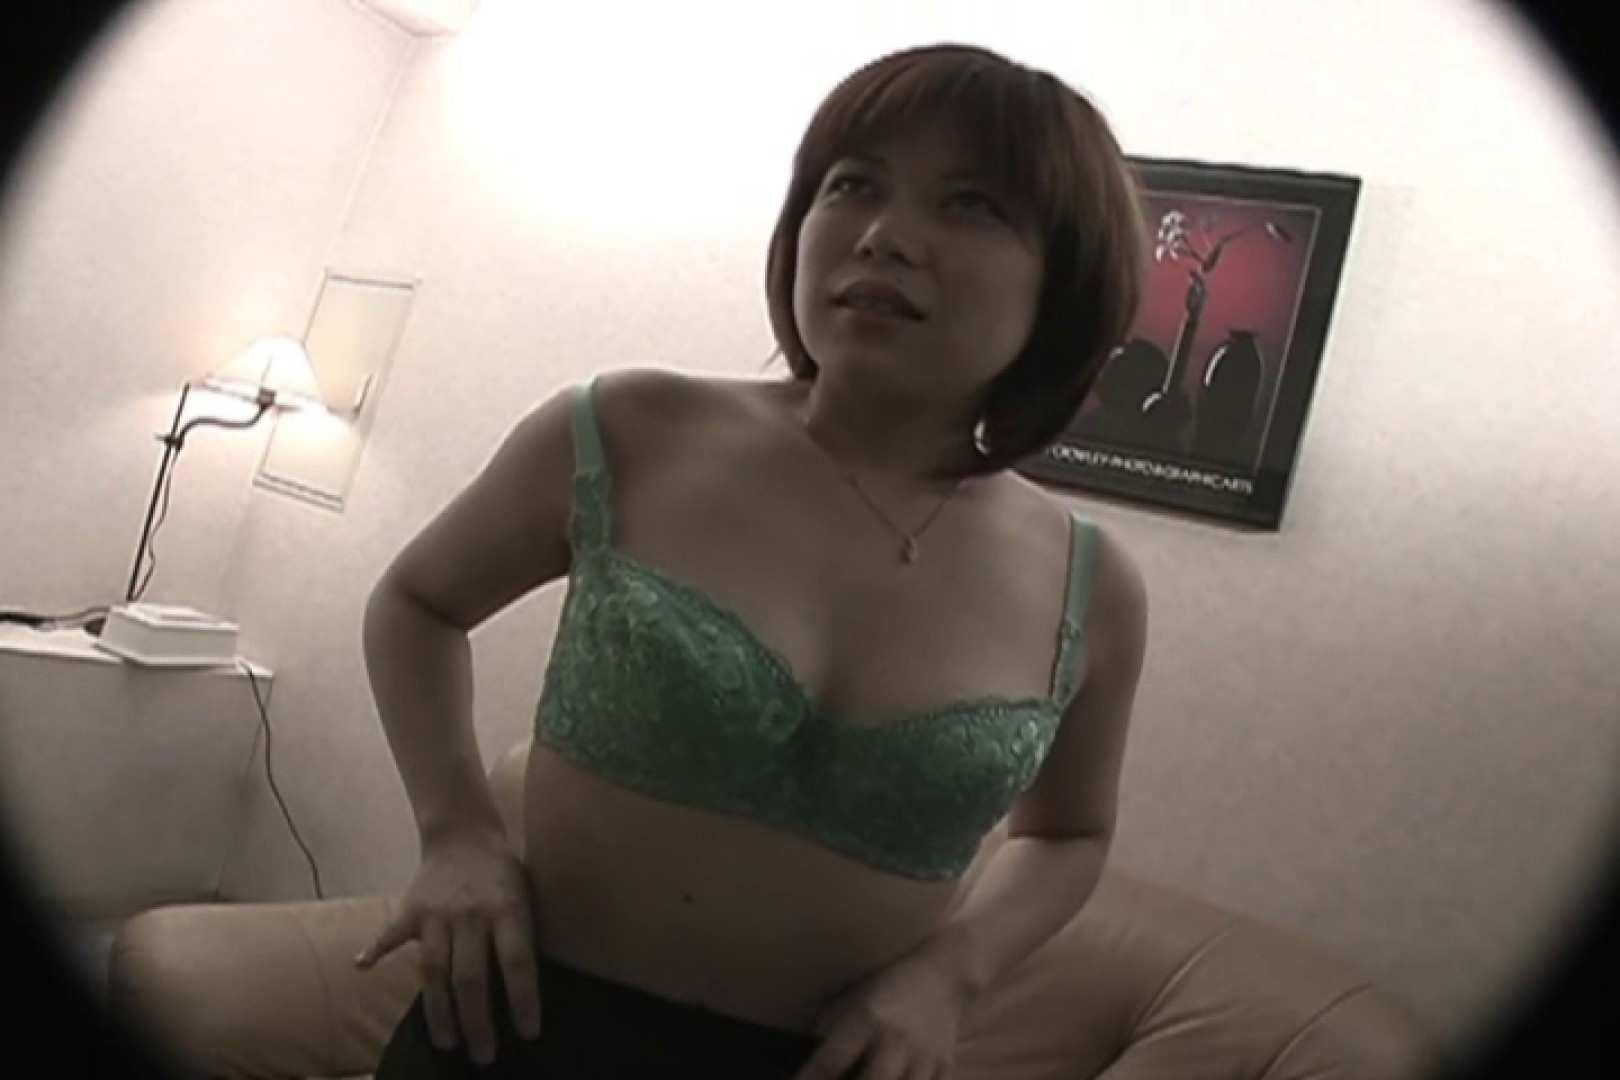 Hするために生まれてきたようなイキまくりの極エロ人妻~小池ゆり~ 熟女  92枚 42